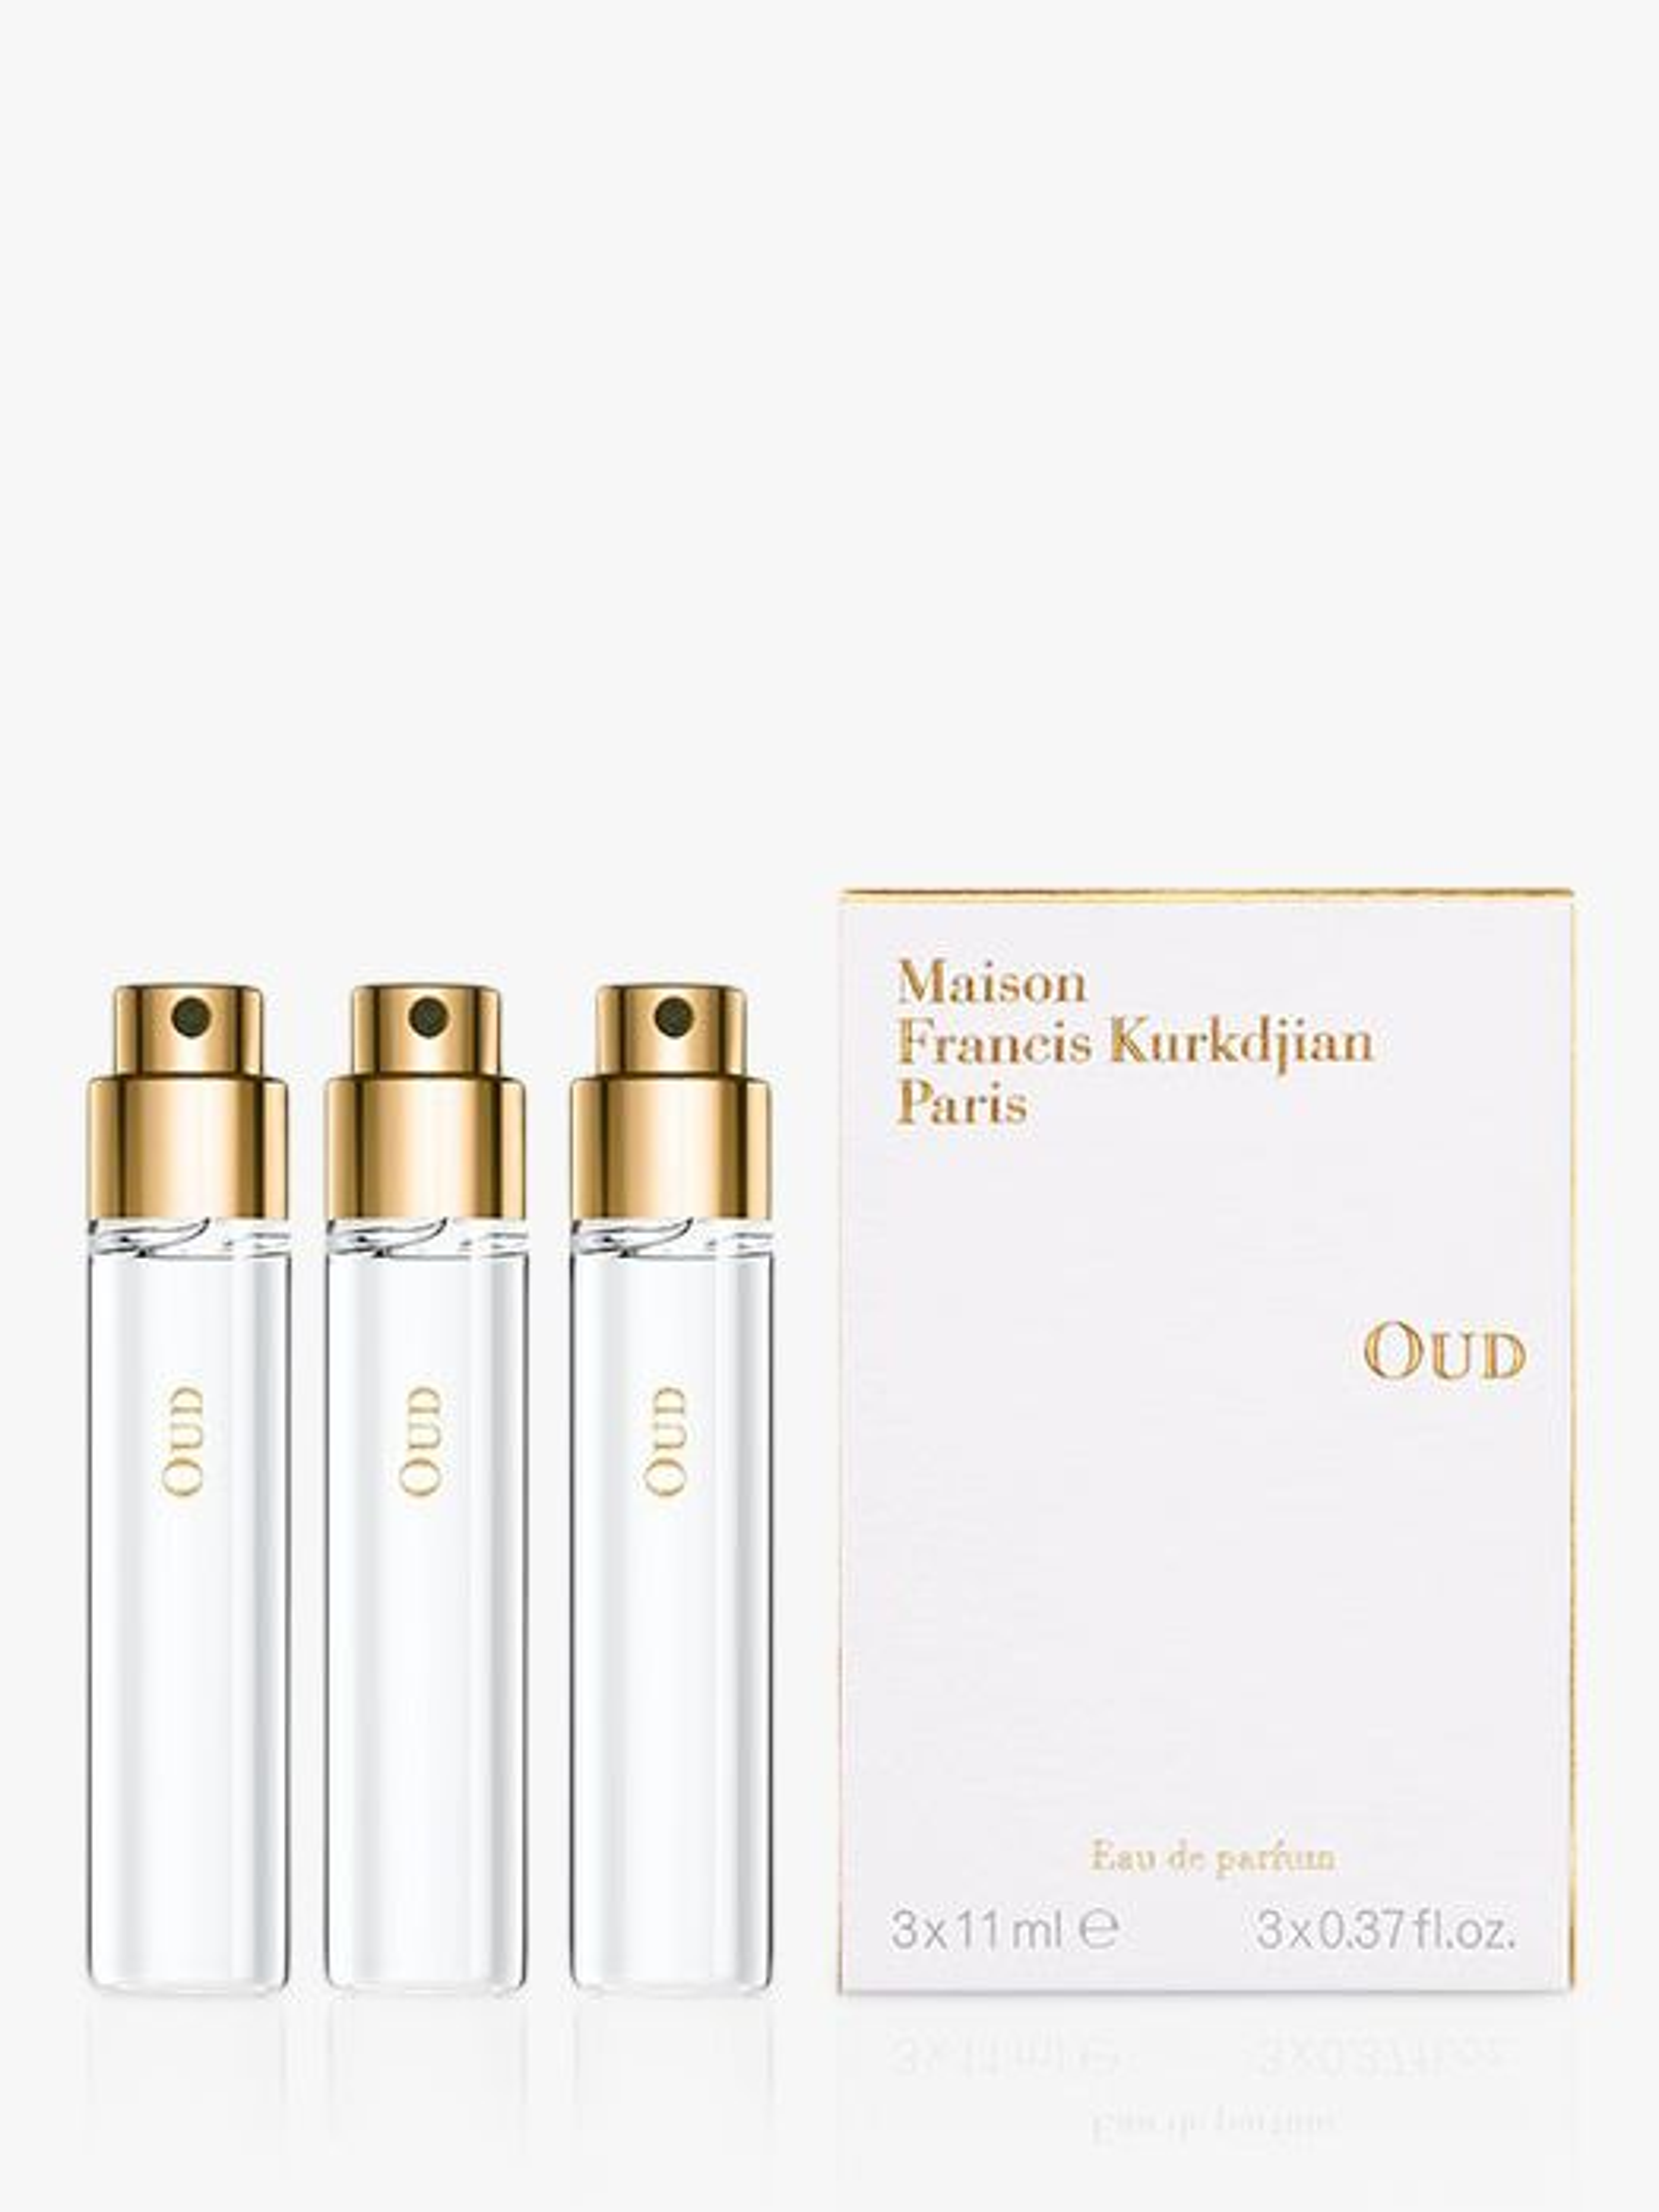 Maison Francis Kurkdjian Maison Francis Kurkdjian Oud Eau de Parfum Natural Spray Refills, 3 x 11ml